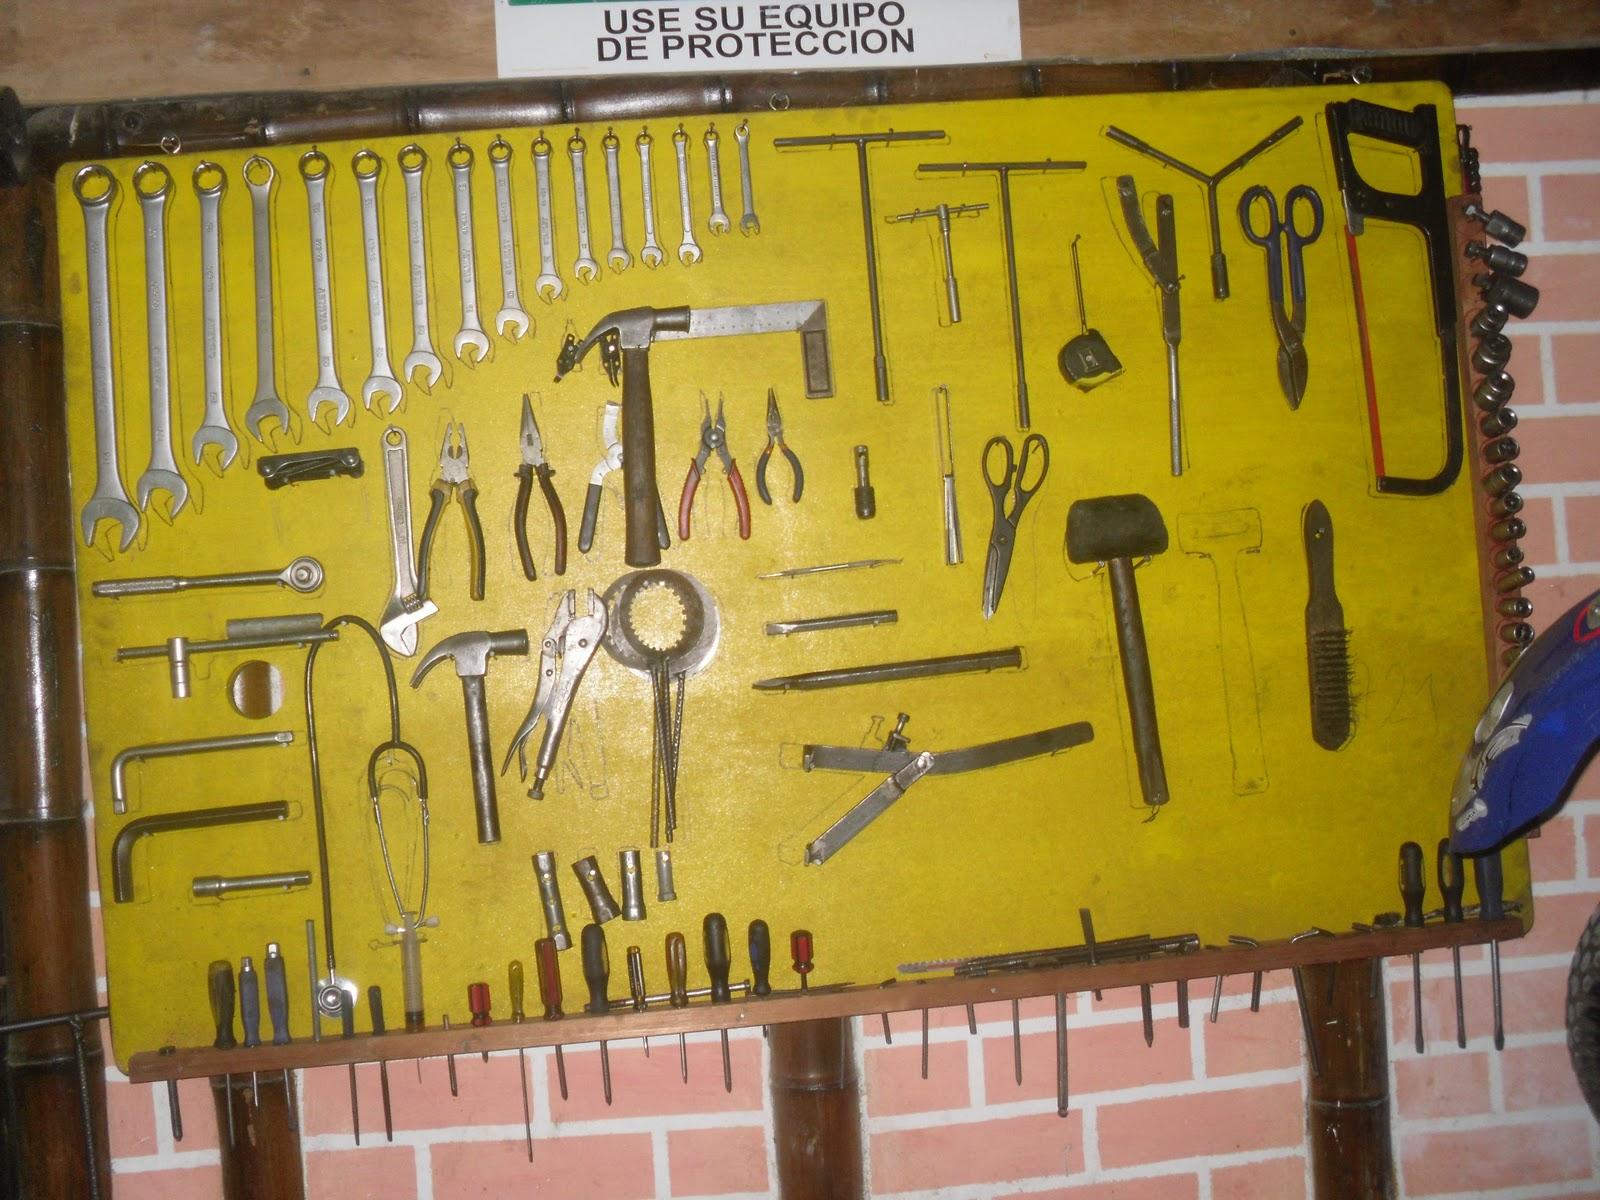 Mecanica de motos sena tablero de herramientas b sicas y - Tablero de herramientas ...